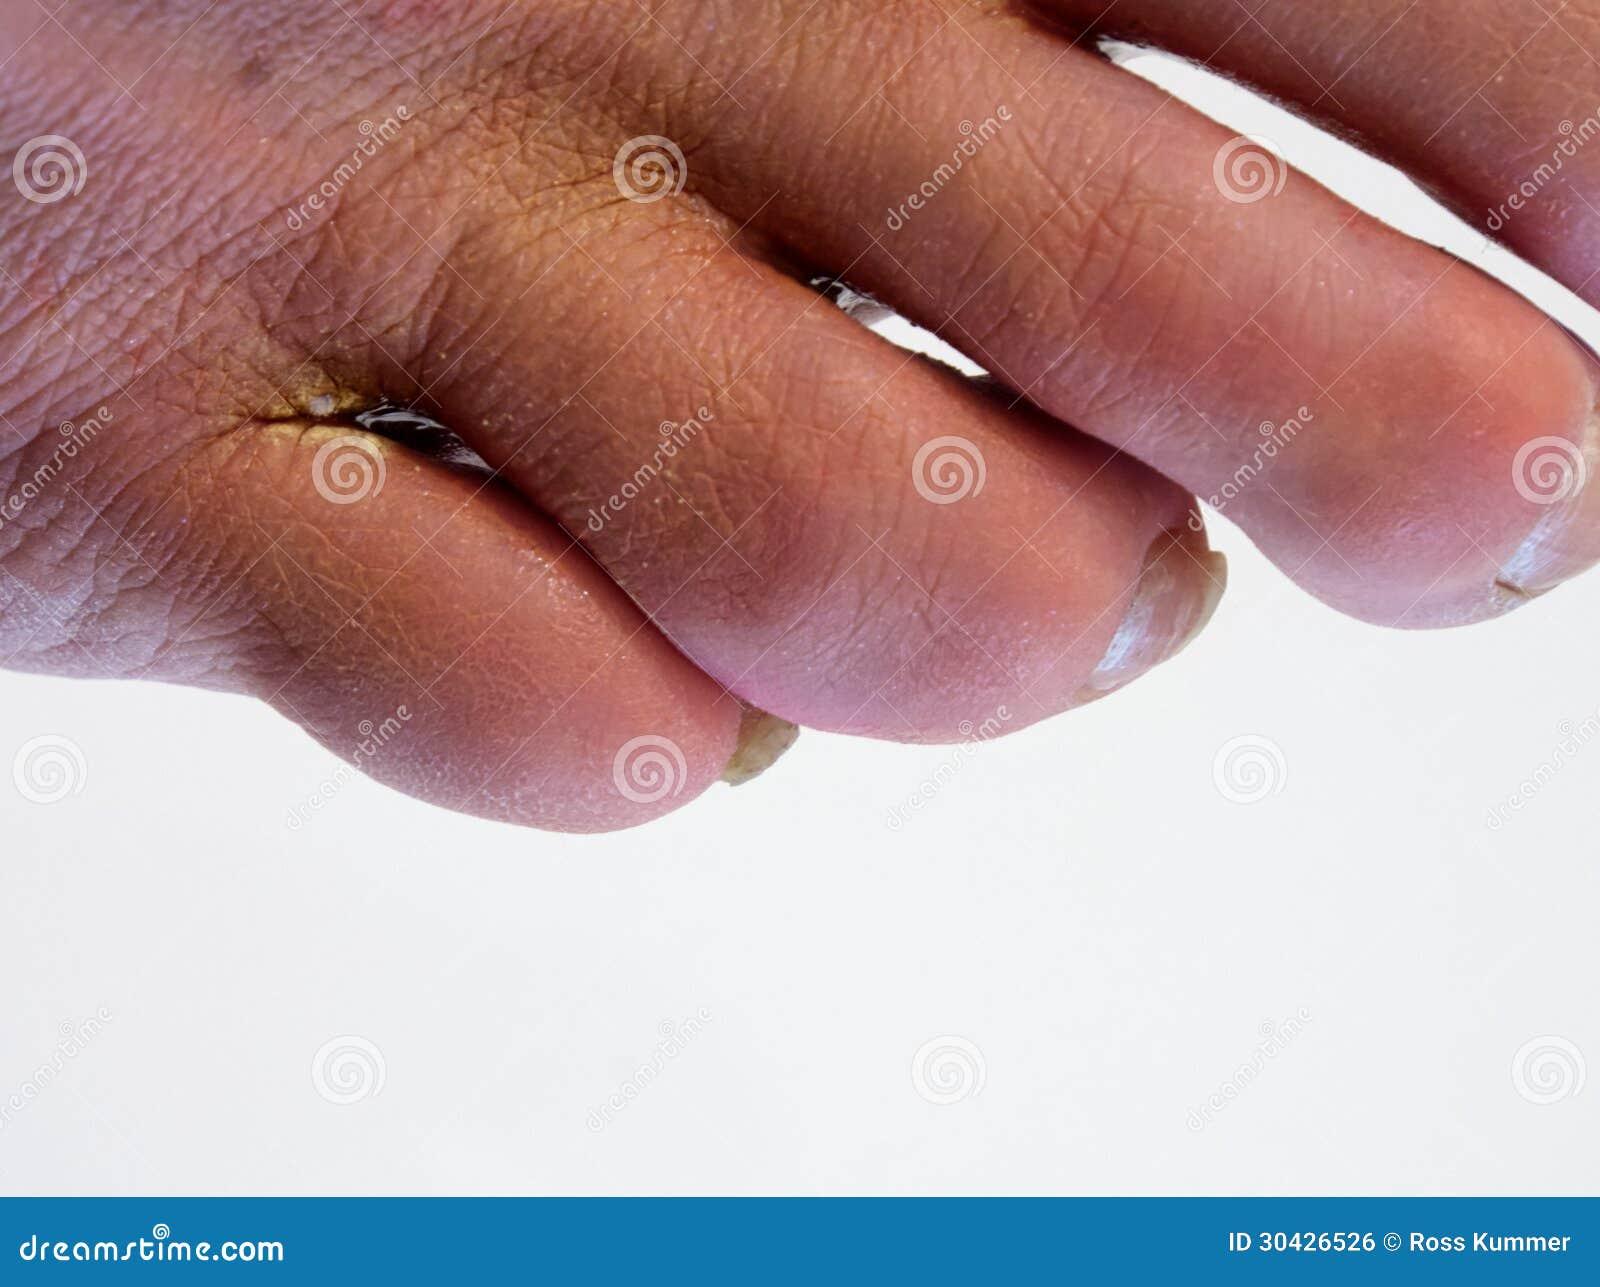 Targhe da un fungo di unghie e posizione di piede